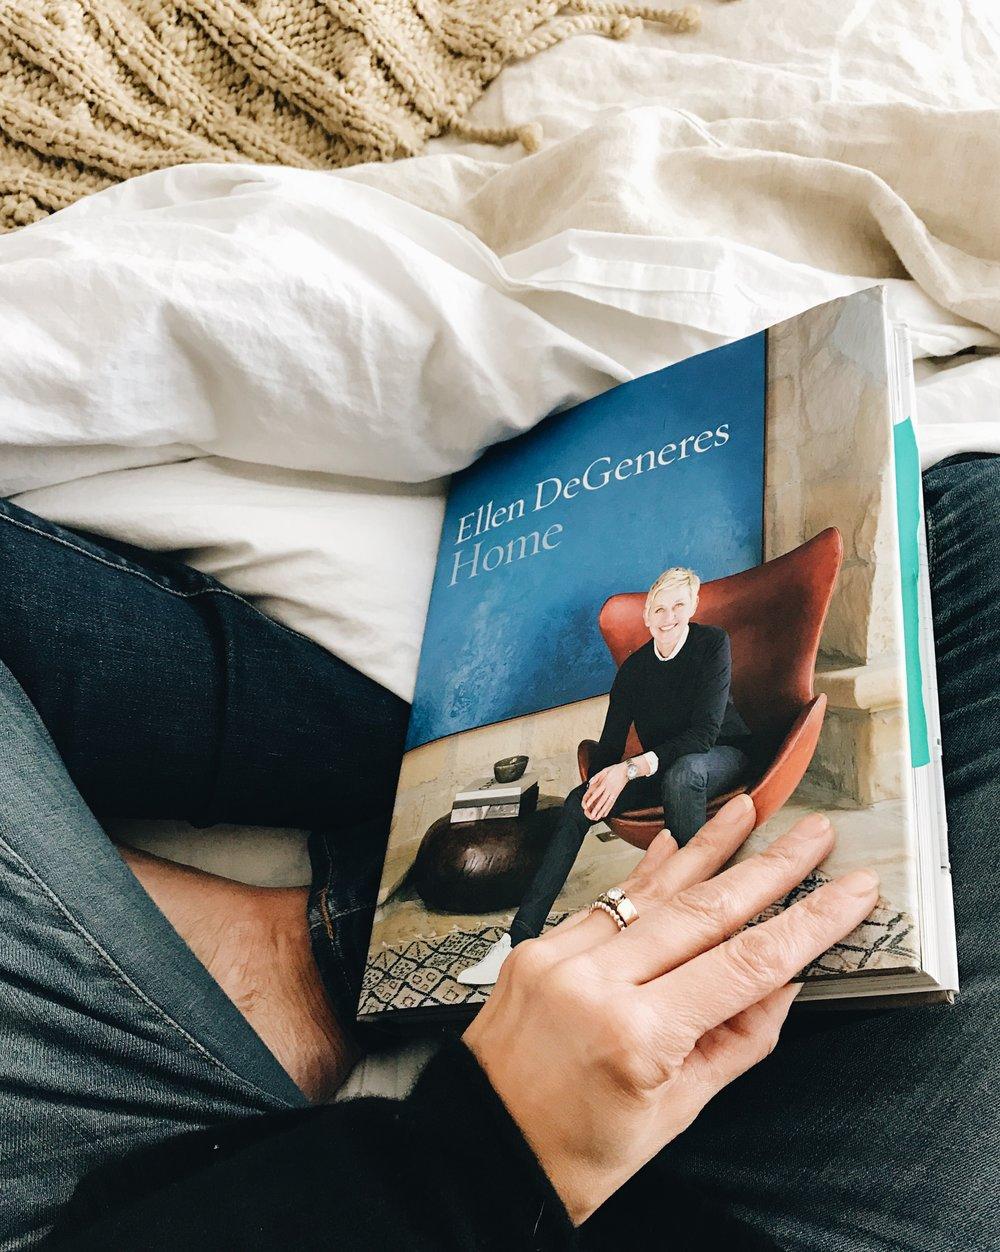 Great reads, Ellen DeGeneres HOME, interior design, inspiration, Nyla Free Designs Inc.